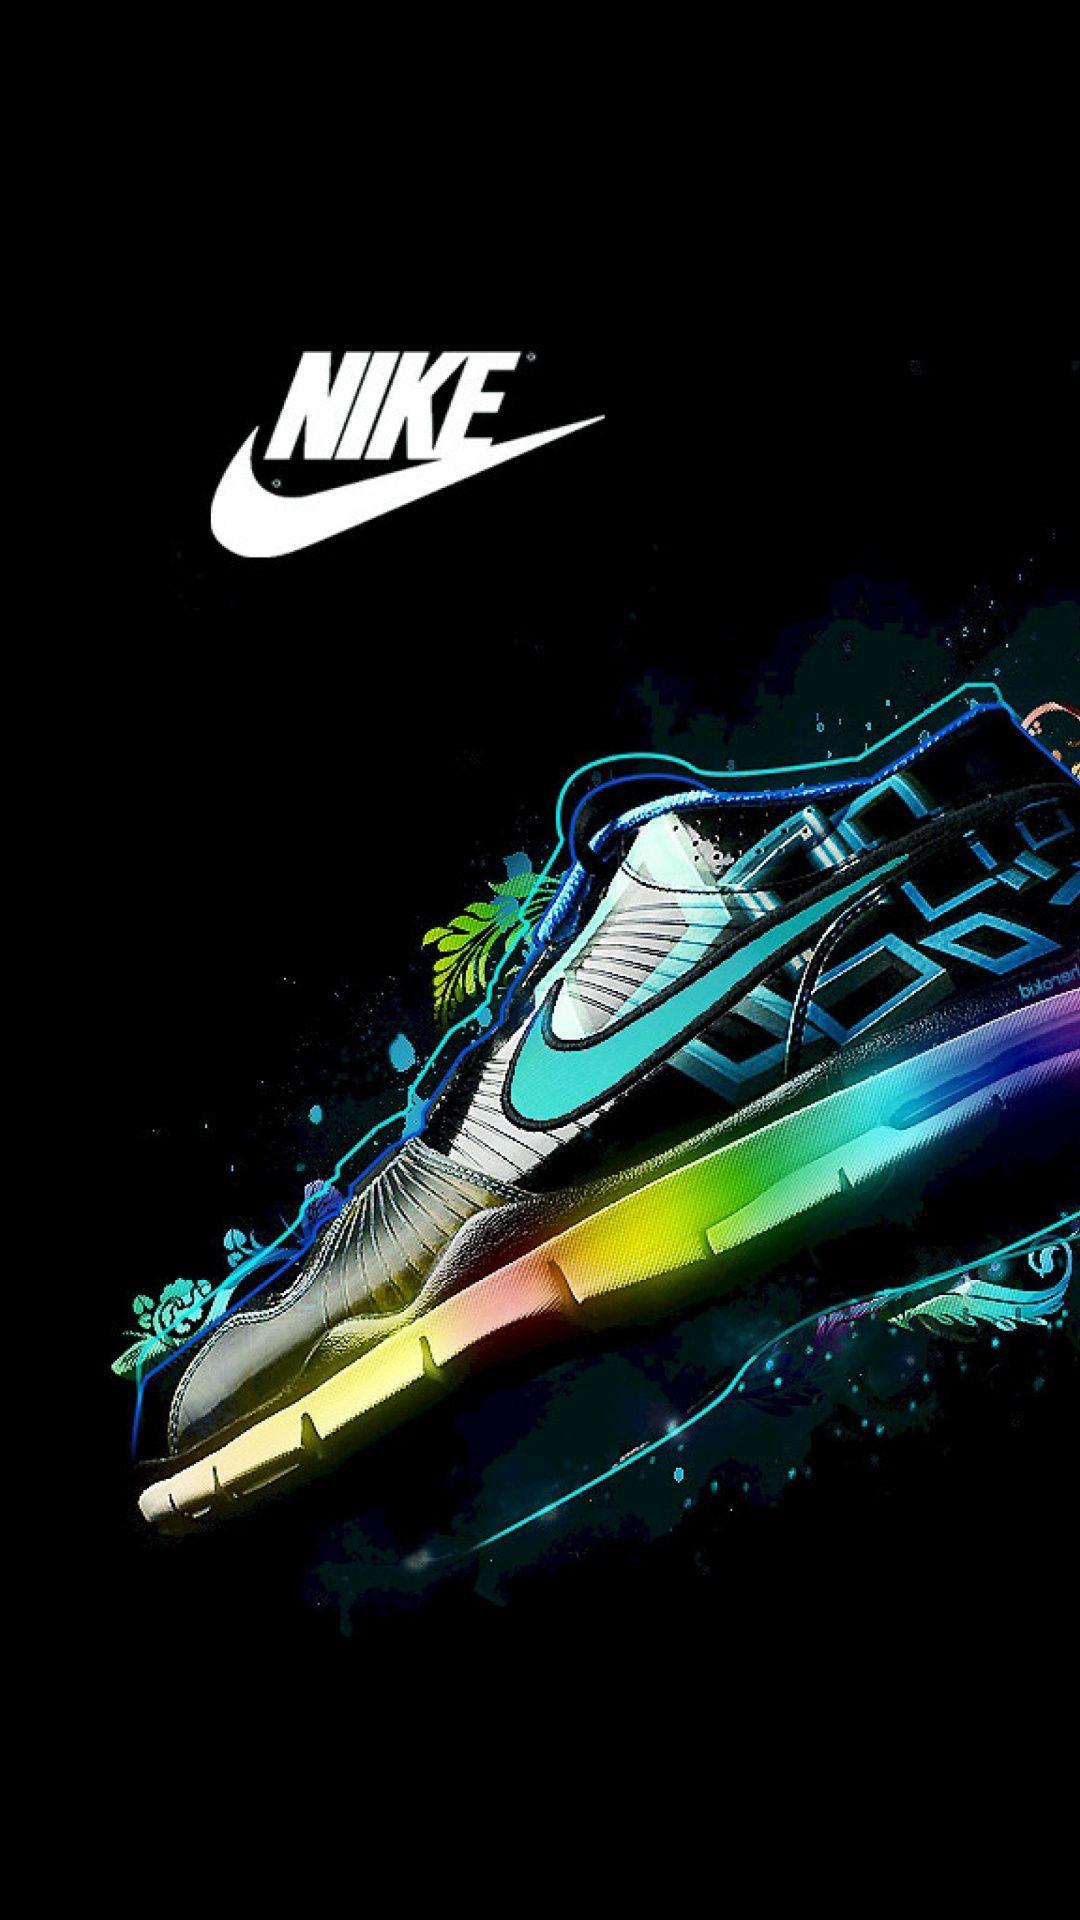 Nike Wallpapers Iphone 64 Wallpapers Hd Wallpapers Kartinki Logotip Telefon